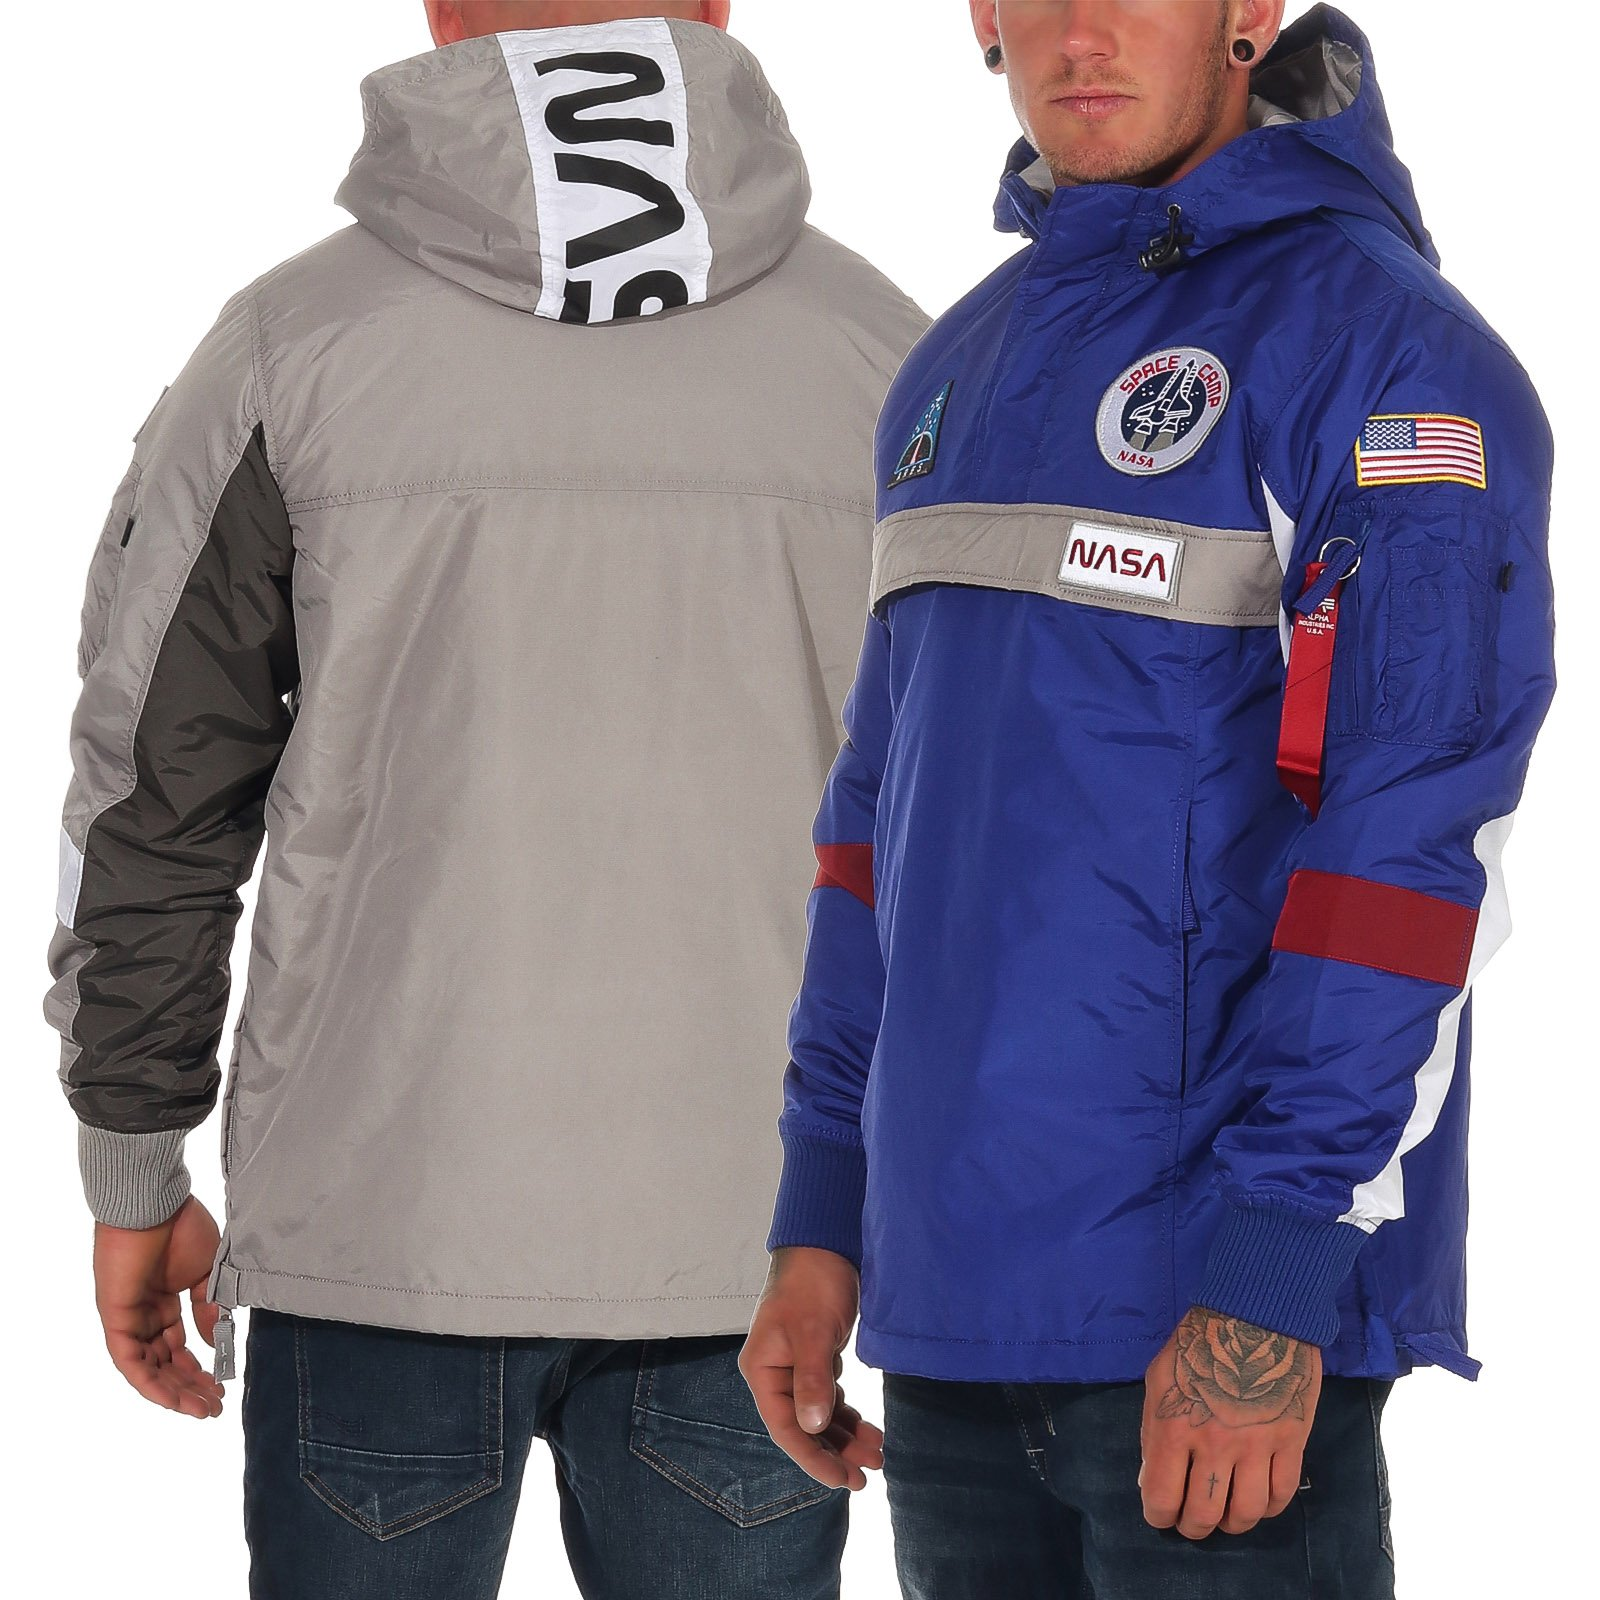 Details Übergangsjacke Jacke NASA zu Alpha Herren